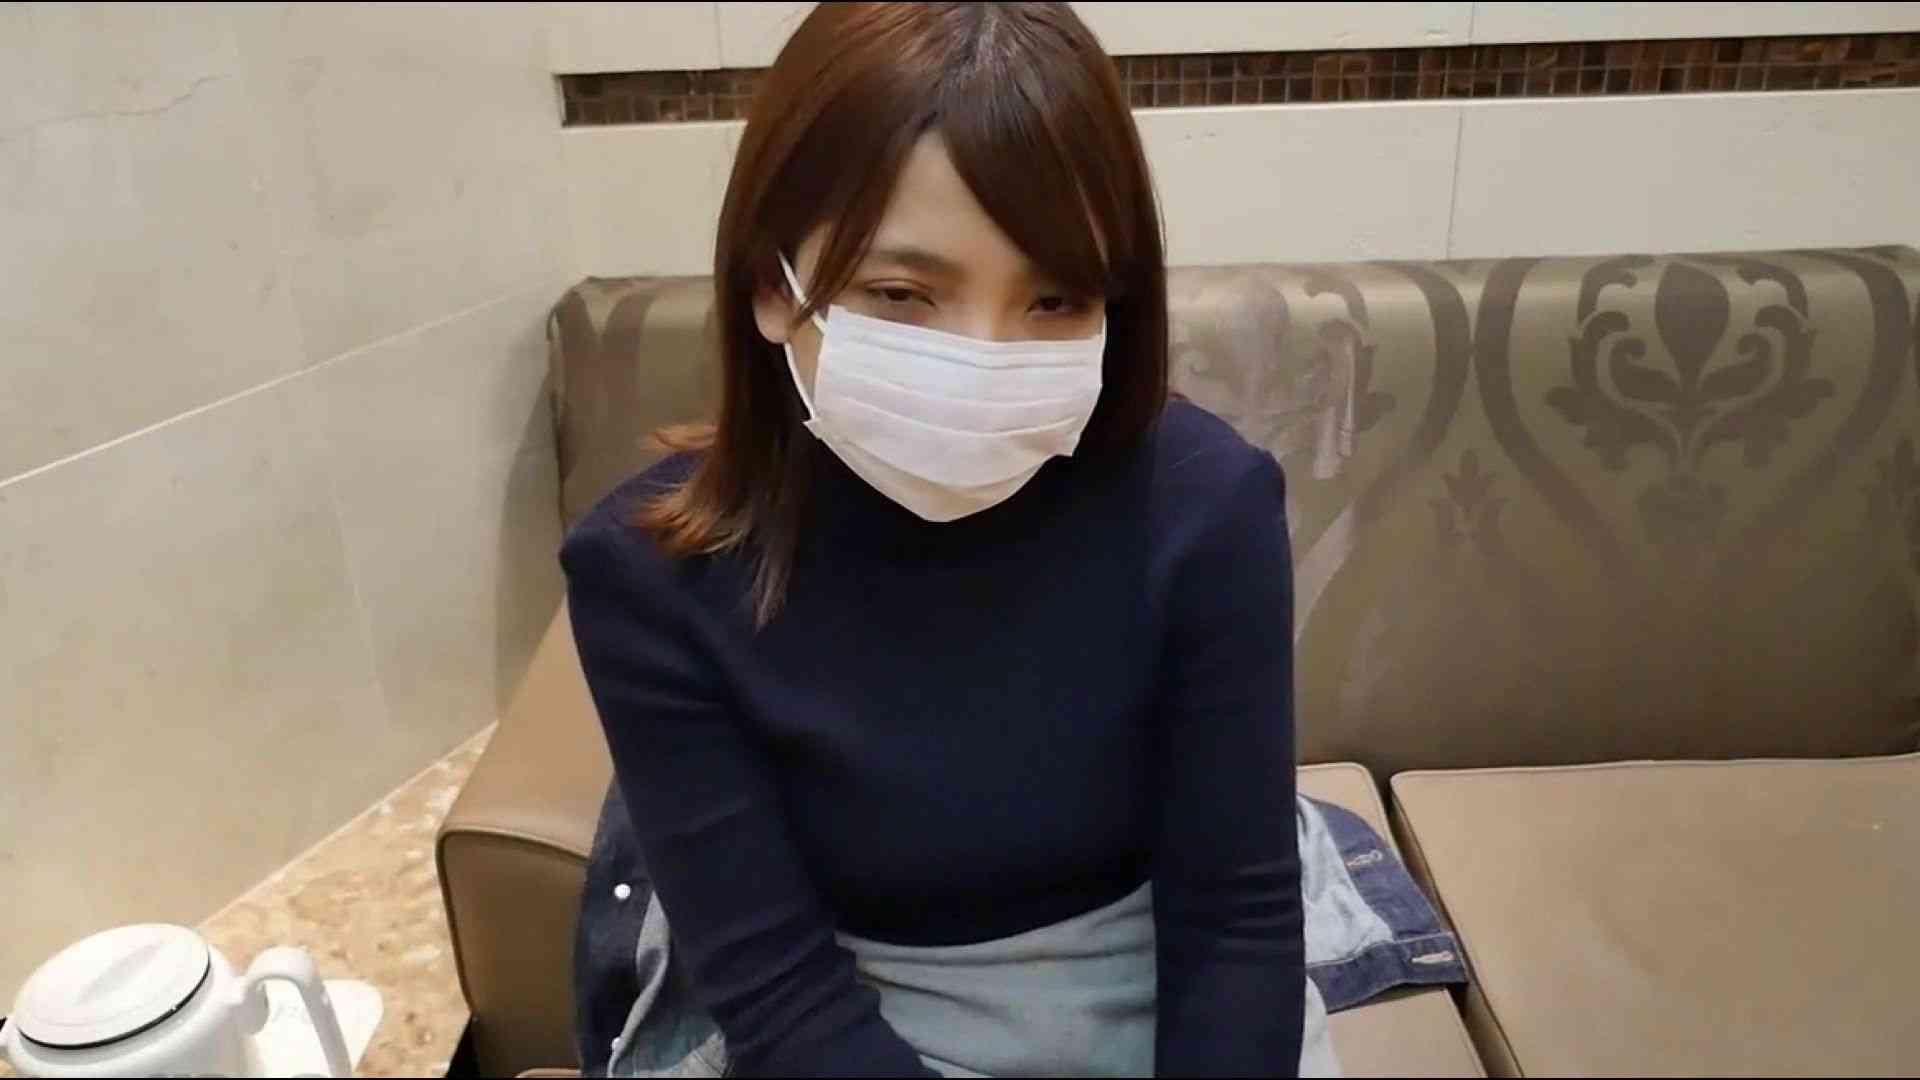 S級厳選美女ビッチガールVol.41 前編 OL女体  105連発 42